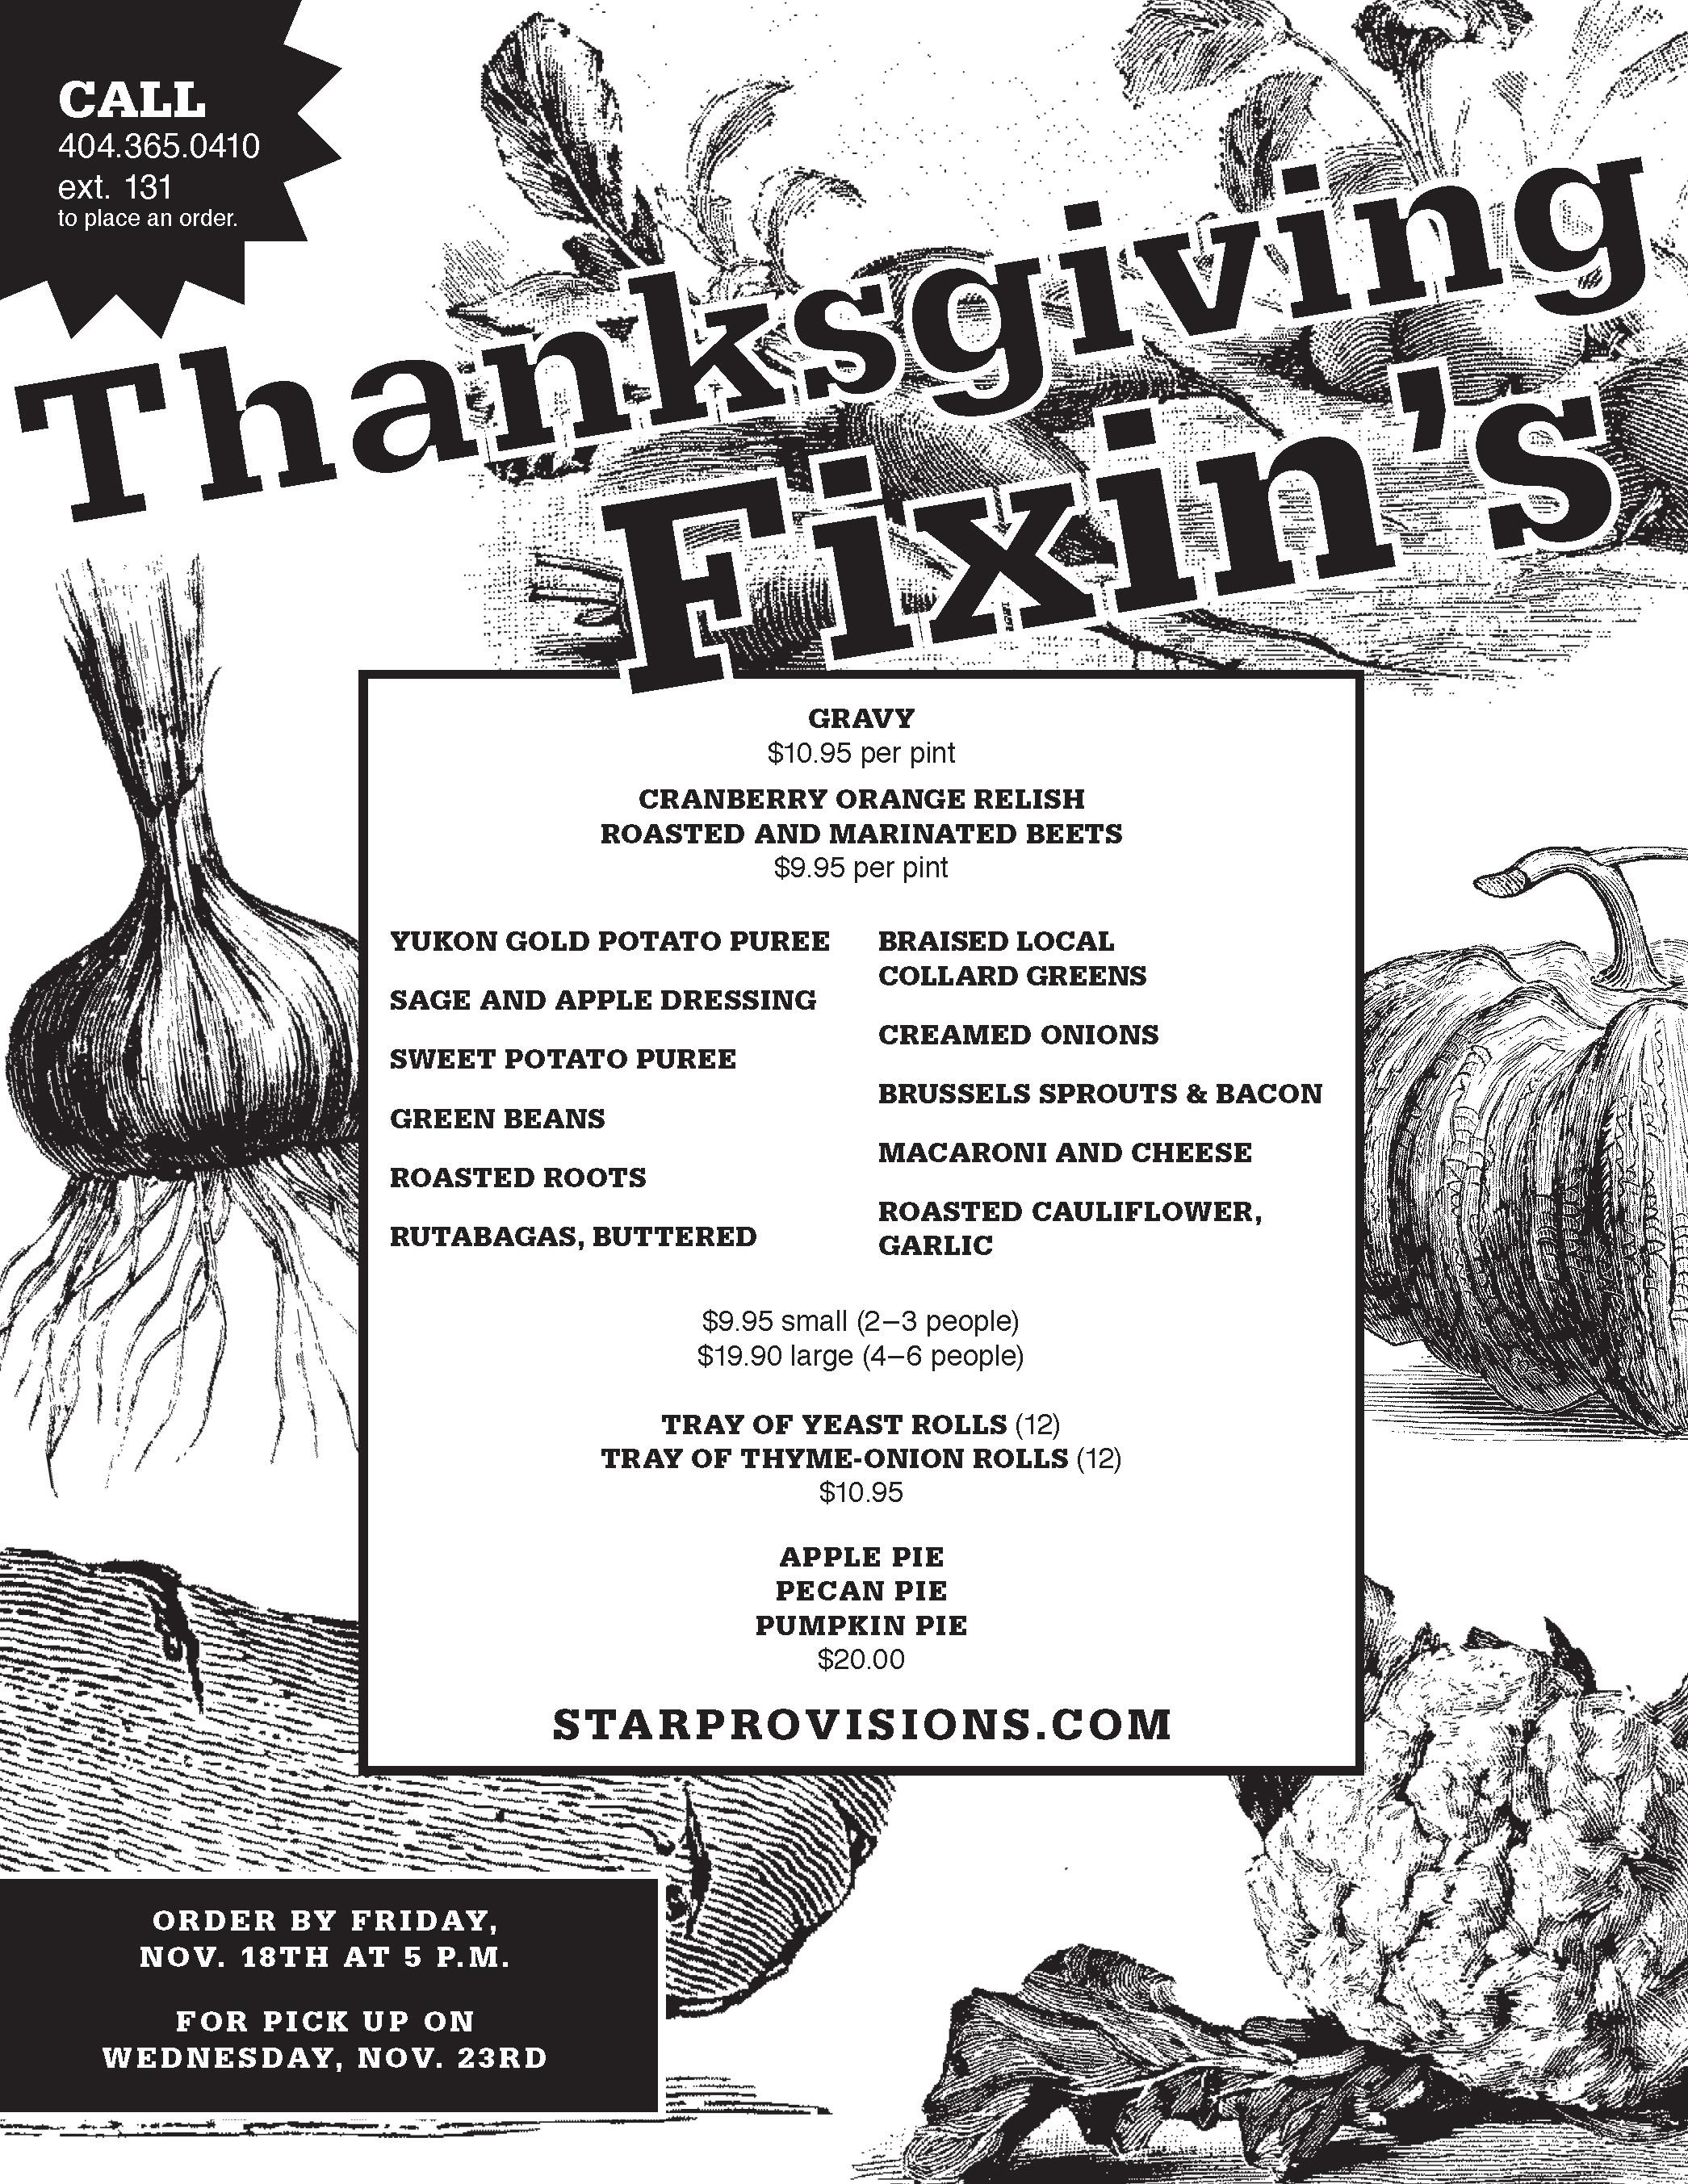 1016-sp-thanksgivingfixins.jpg